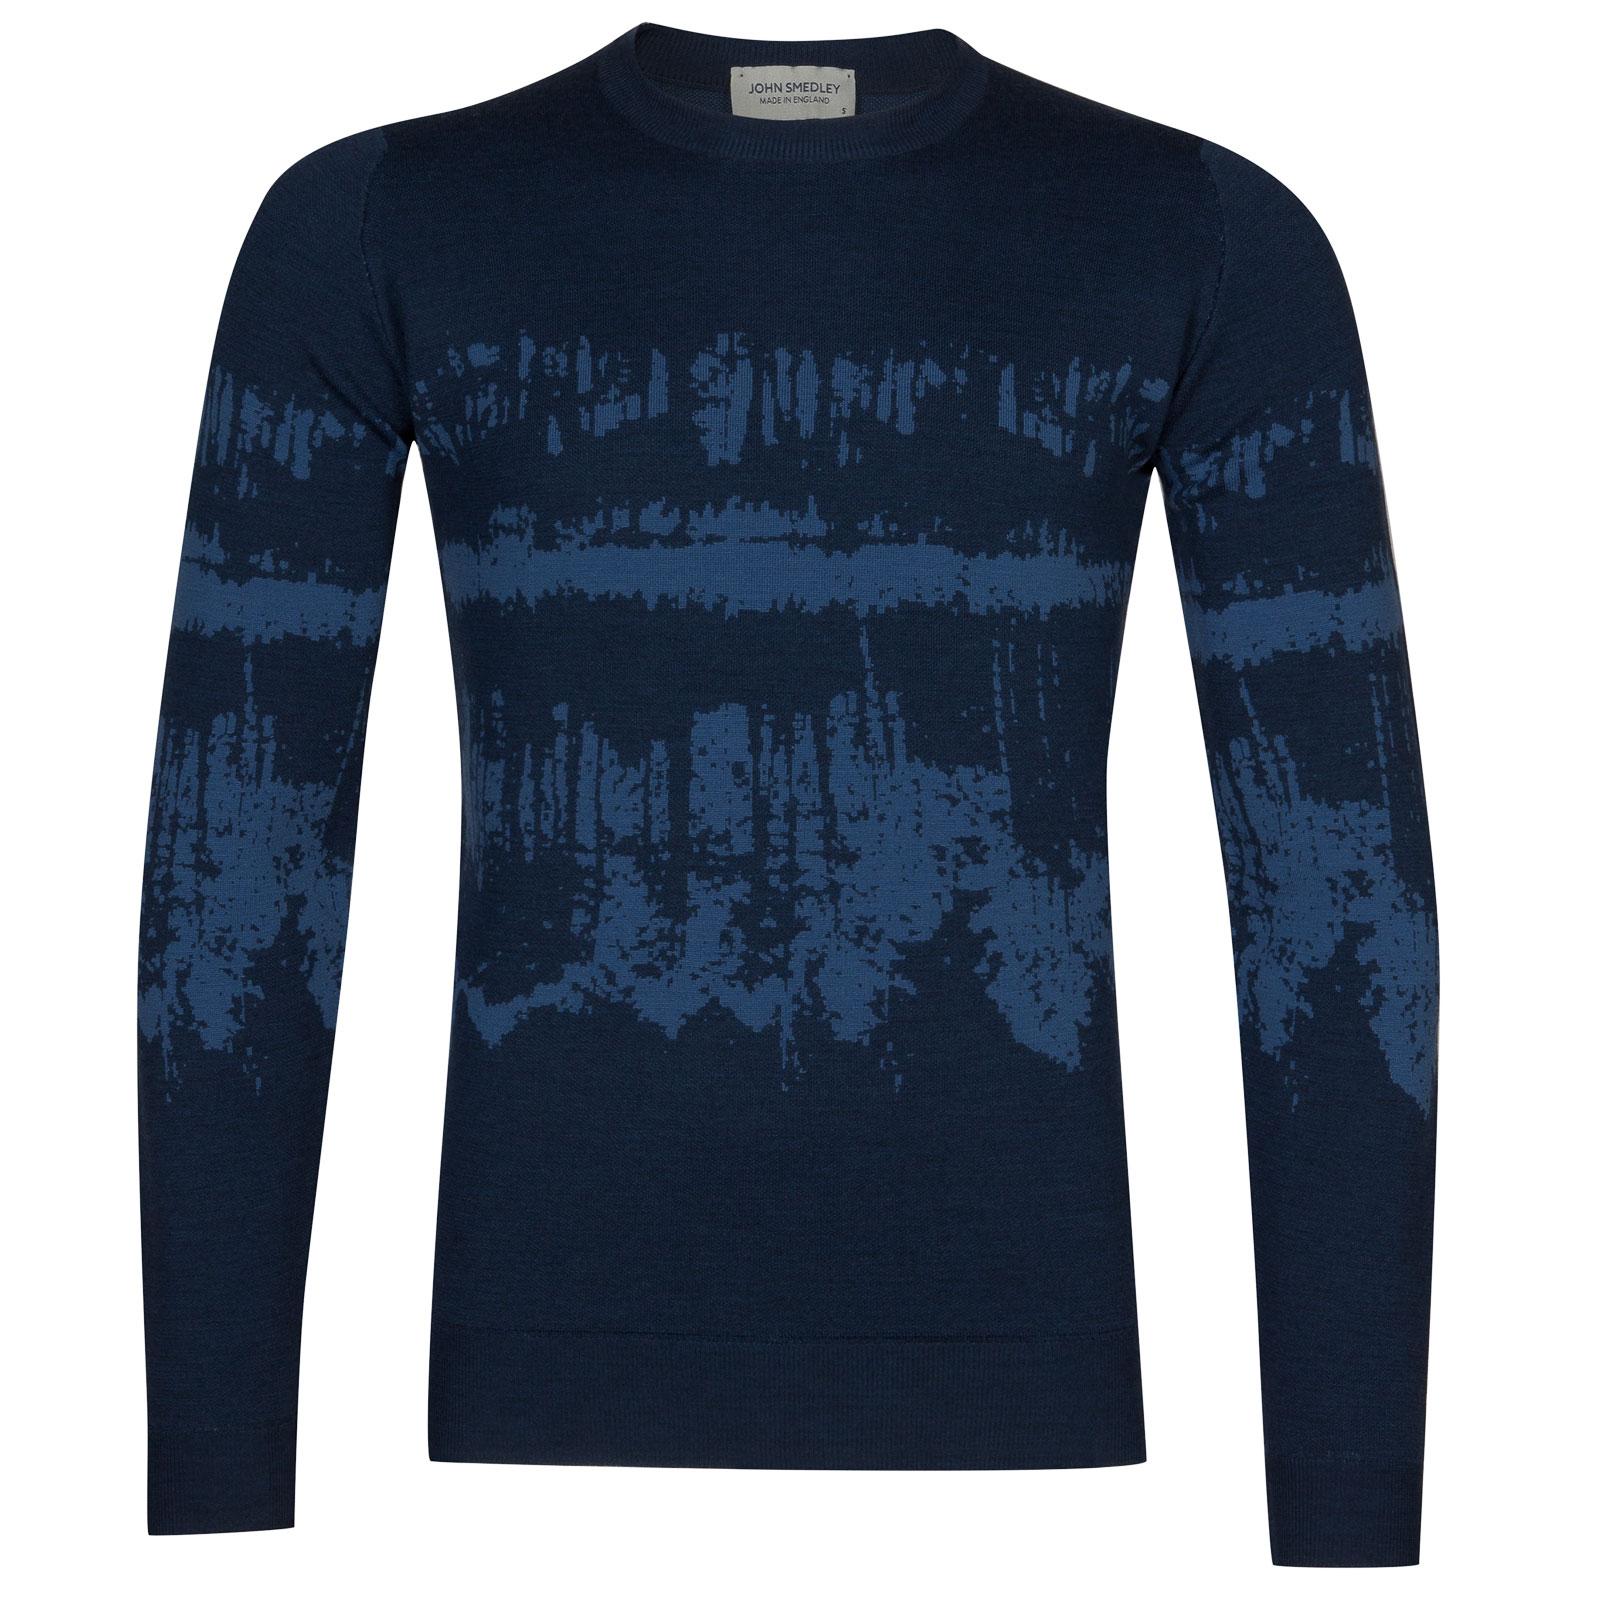 John Smedley girling Merino Wool Pullover in Indigo/Derwent Blue-M